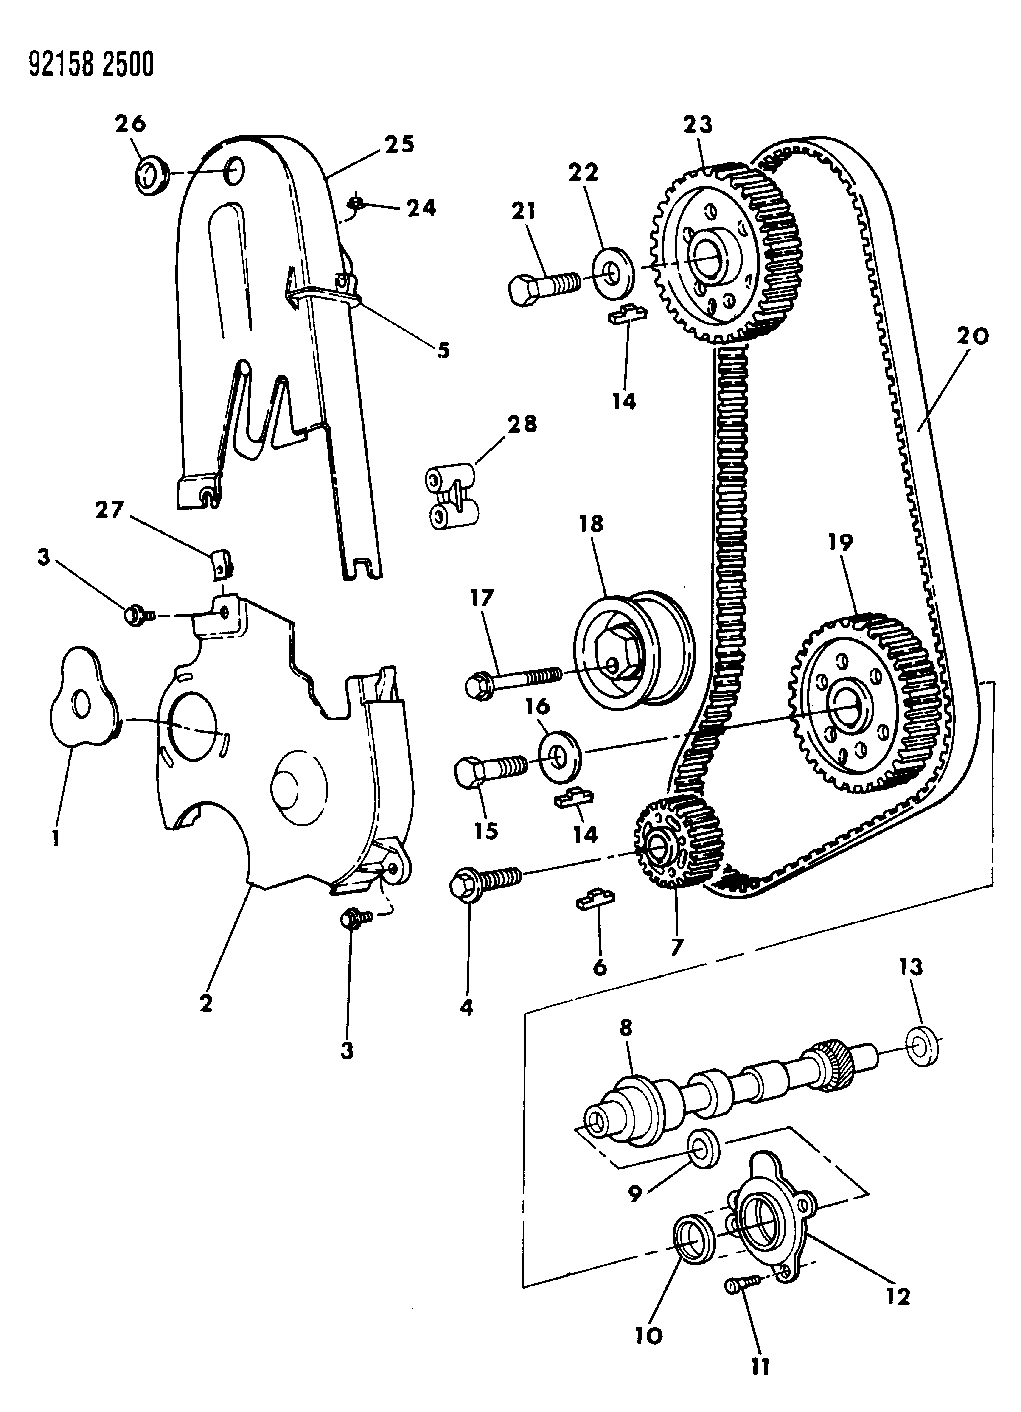 1992 Dodge Shadow Timing Belt Chain Cover Intermediate Shaft Wiring Diagram